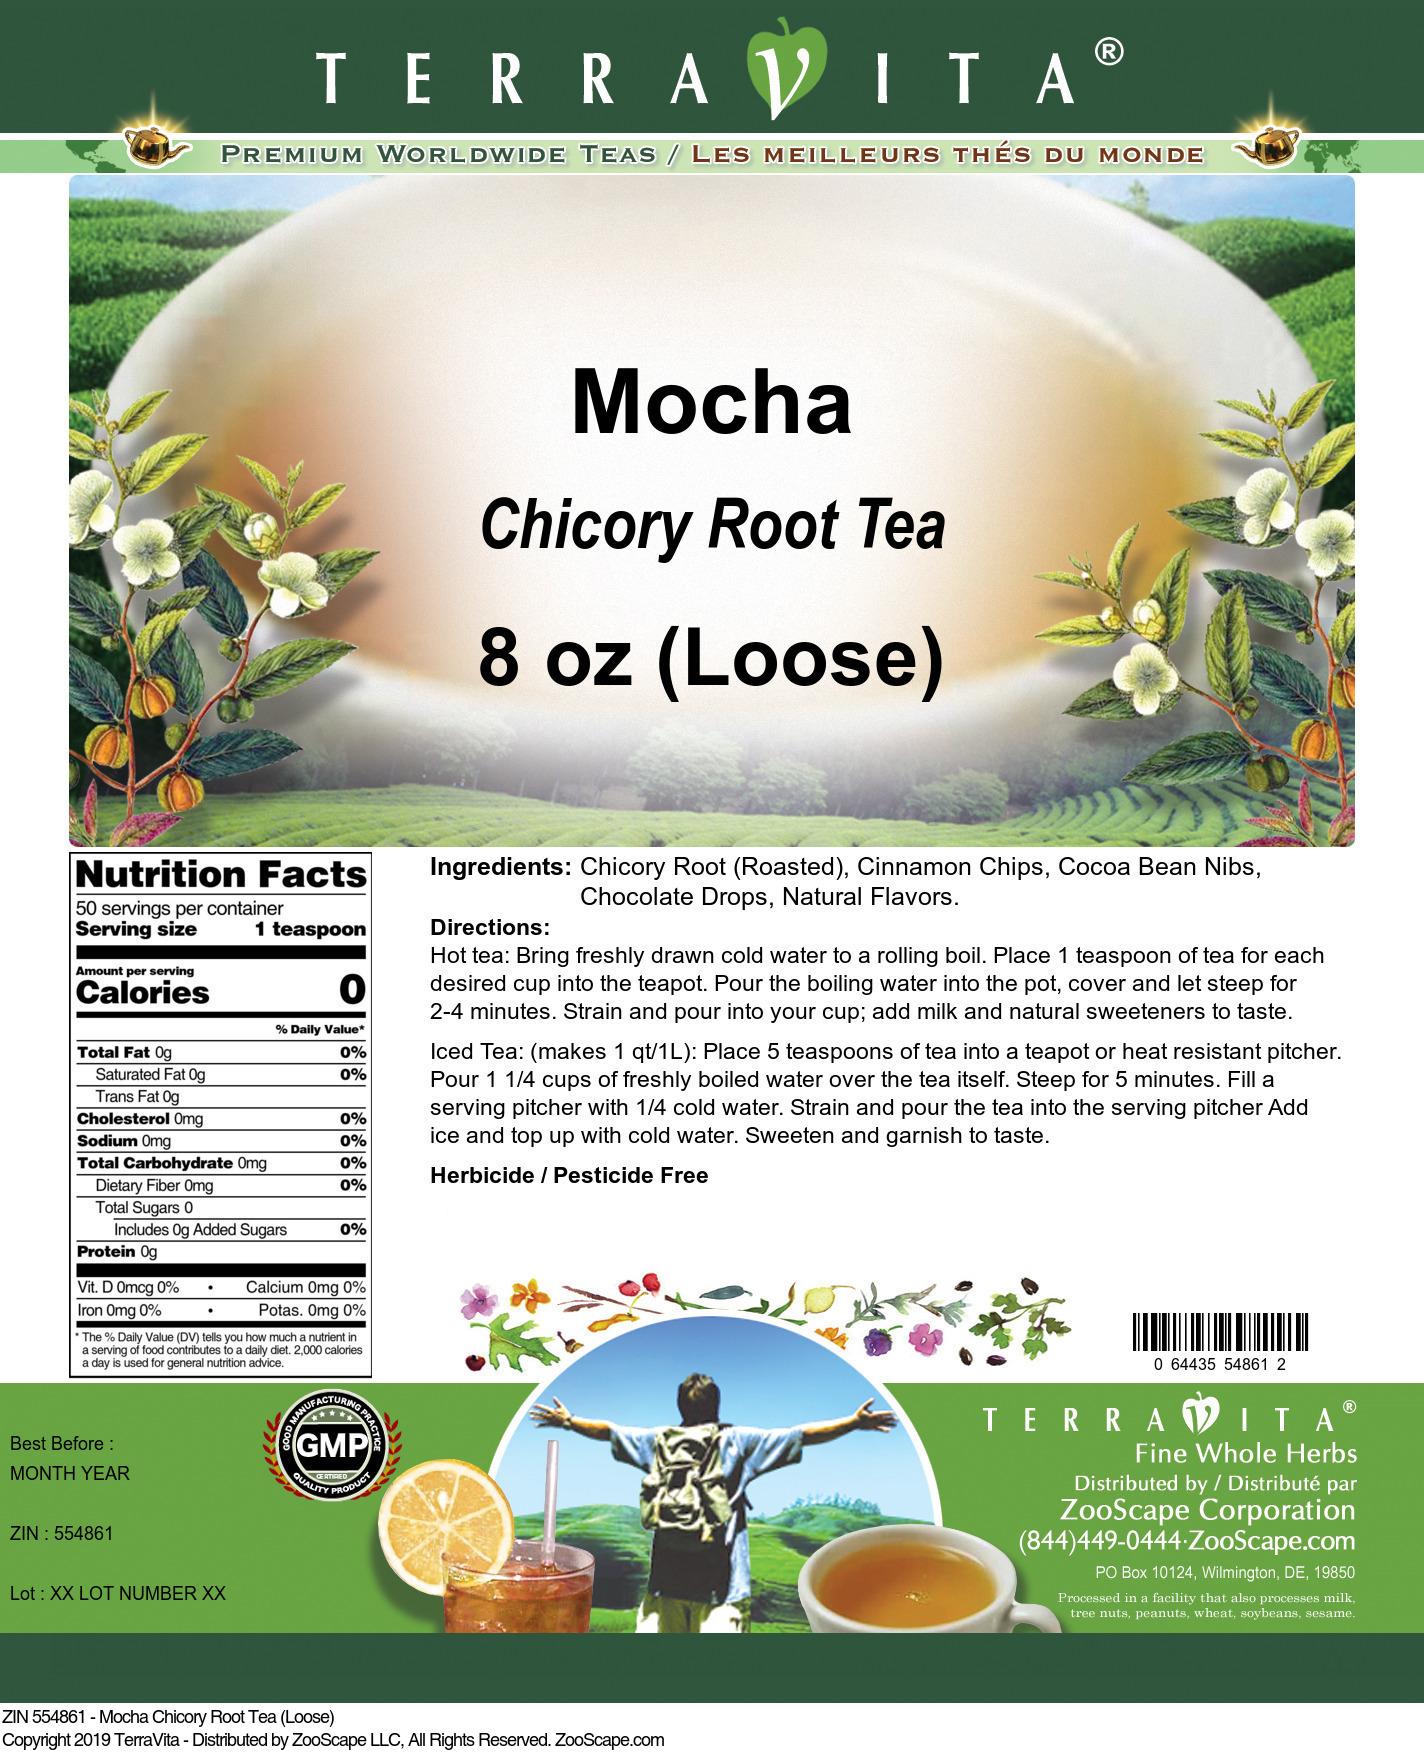 Mocha Chicory Root